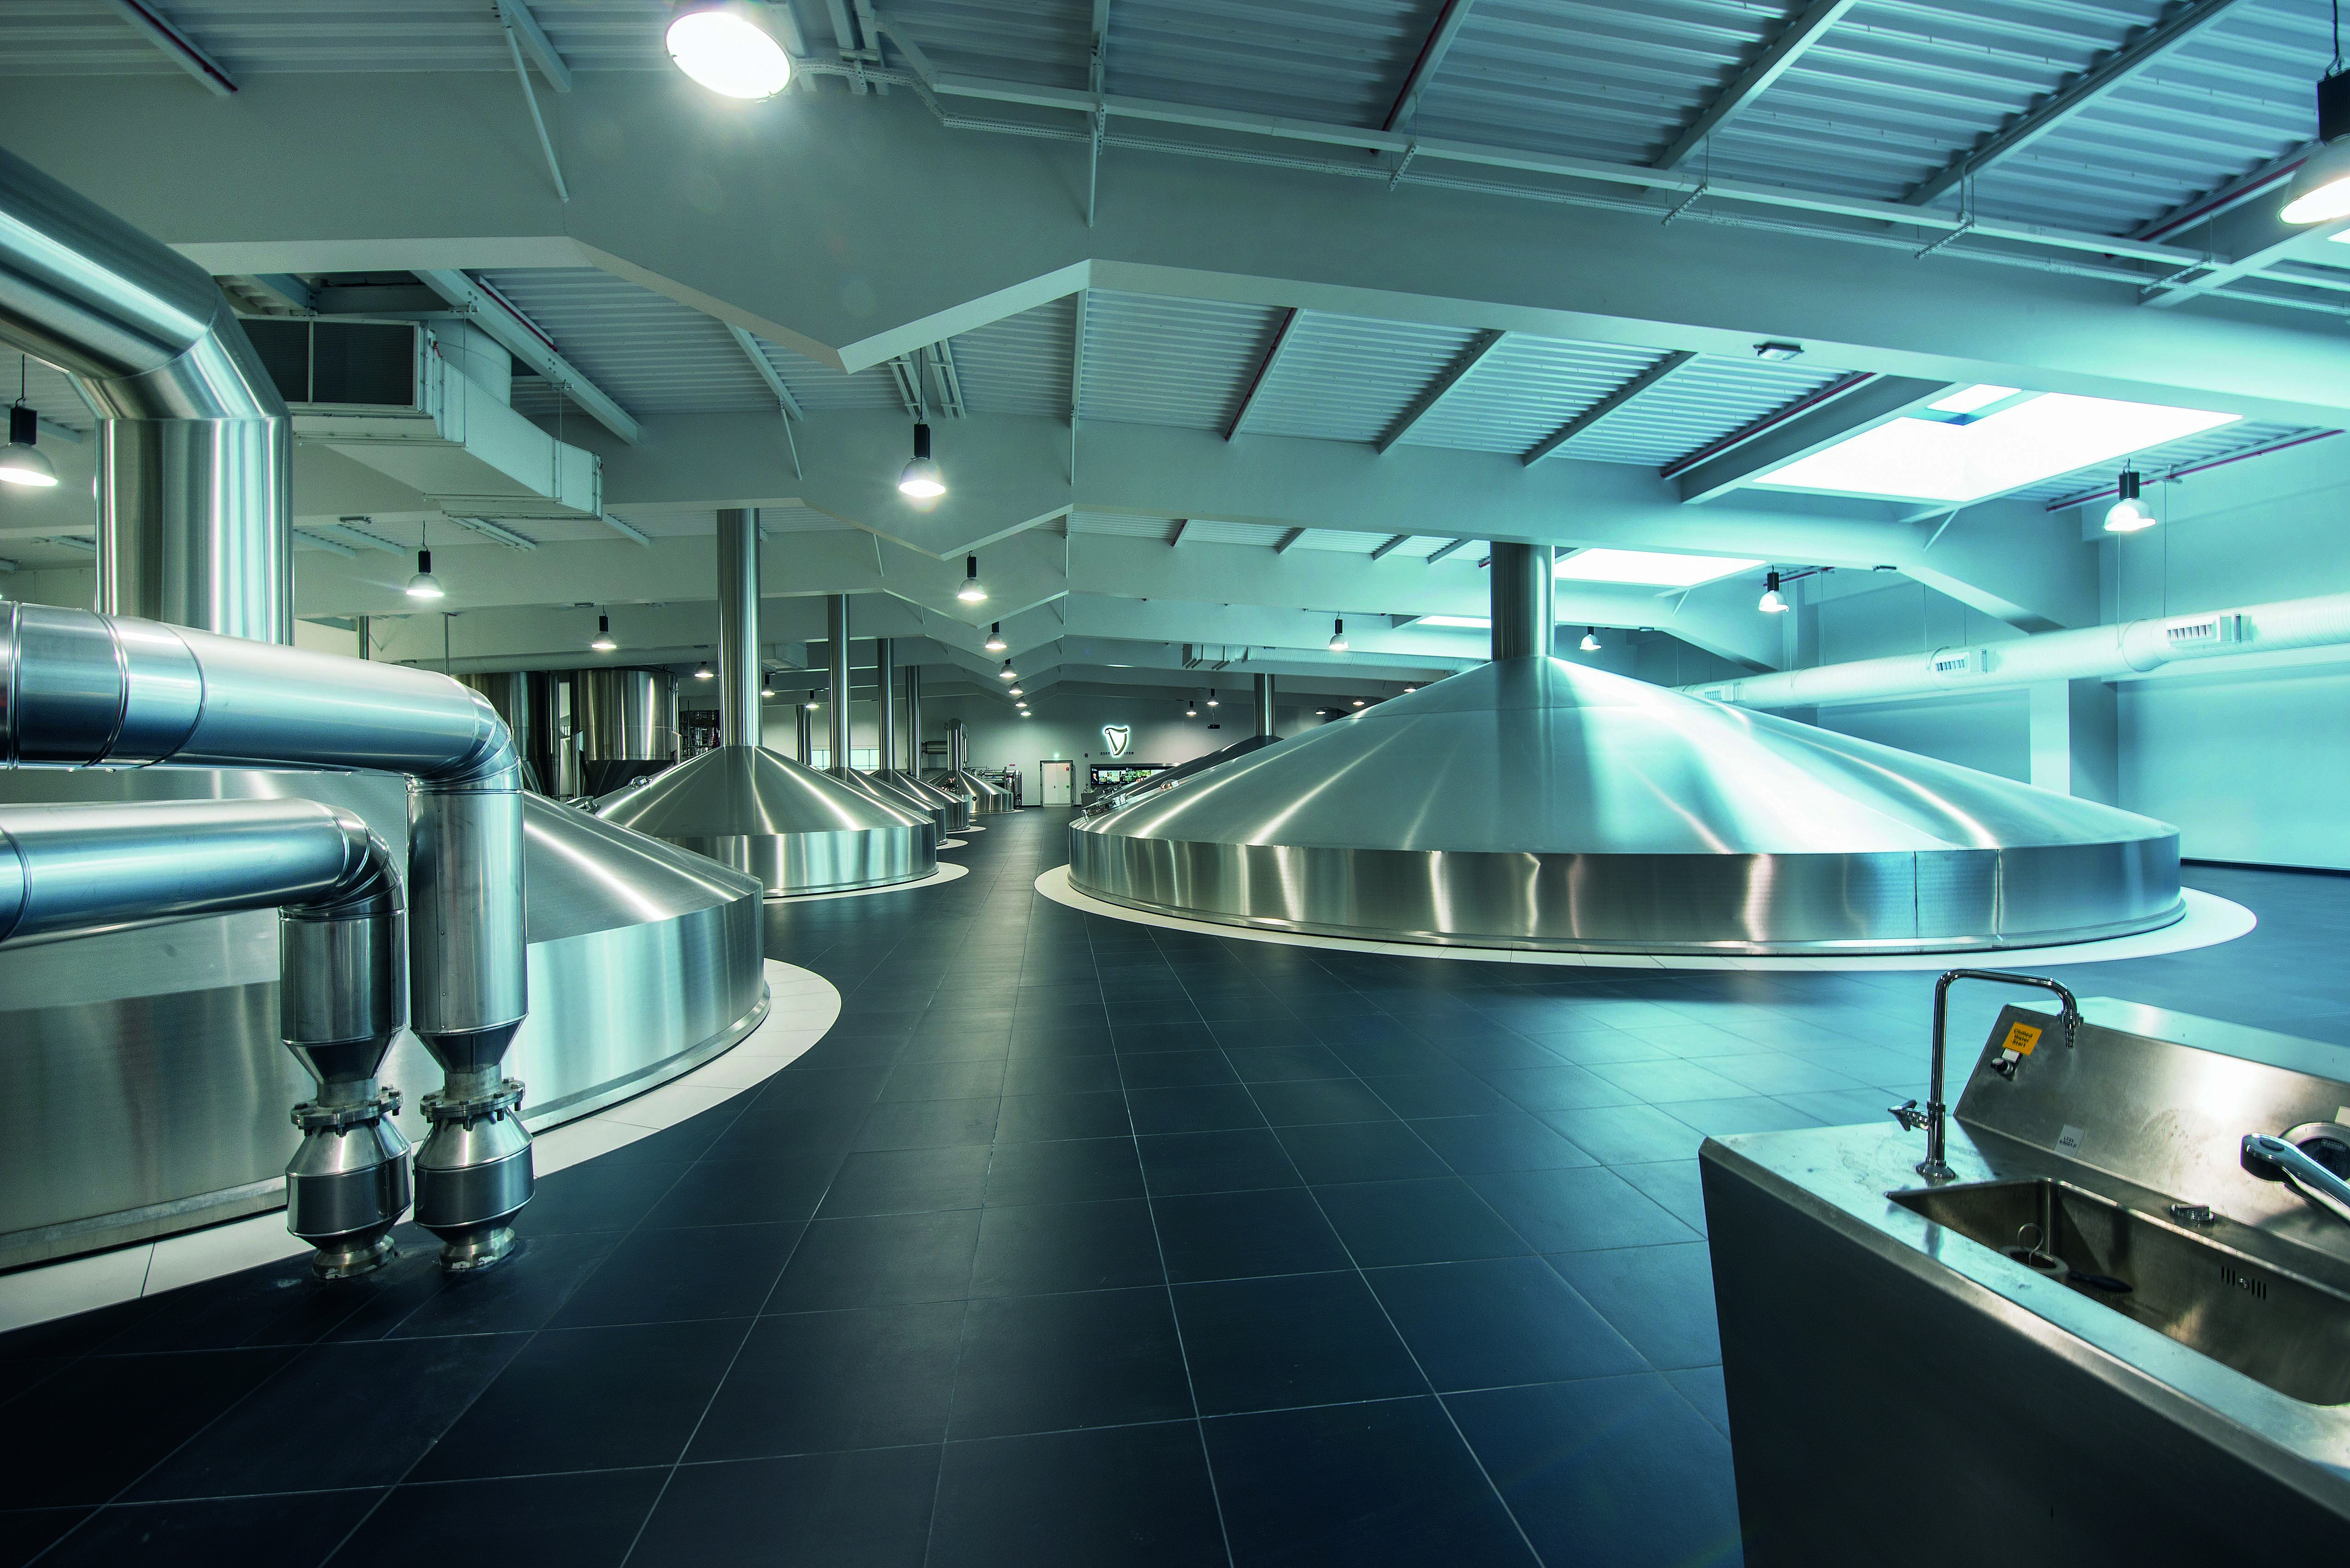 Diageo brewery facility, Dublin, Ireland